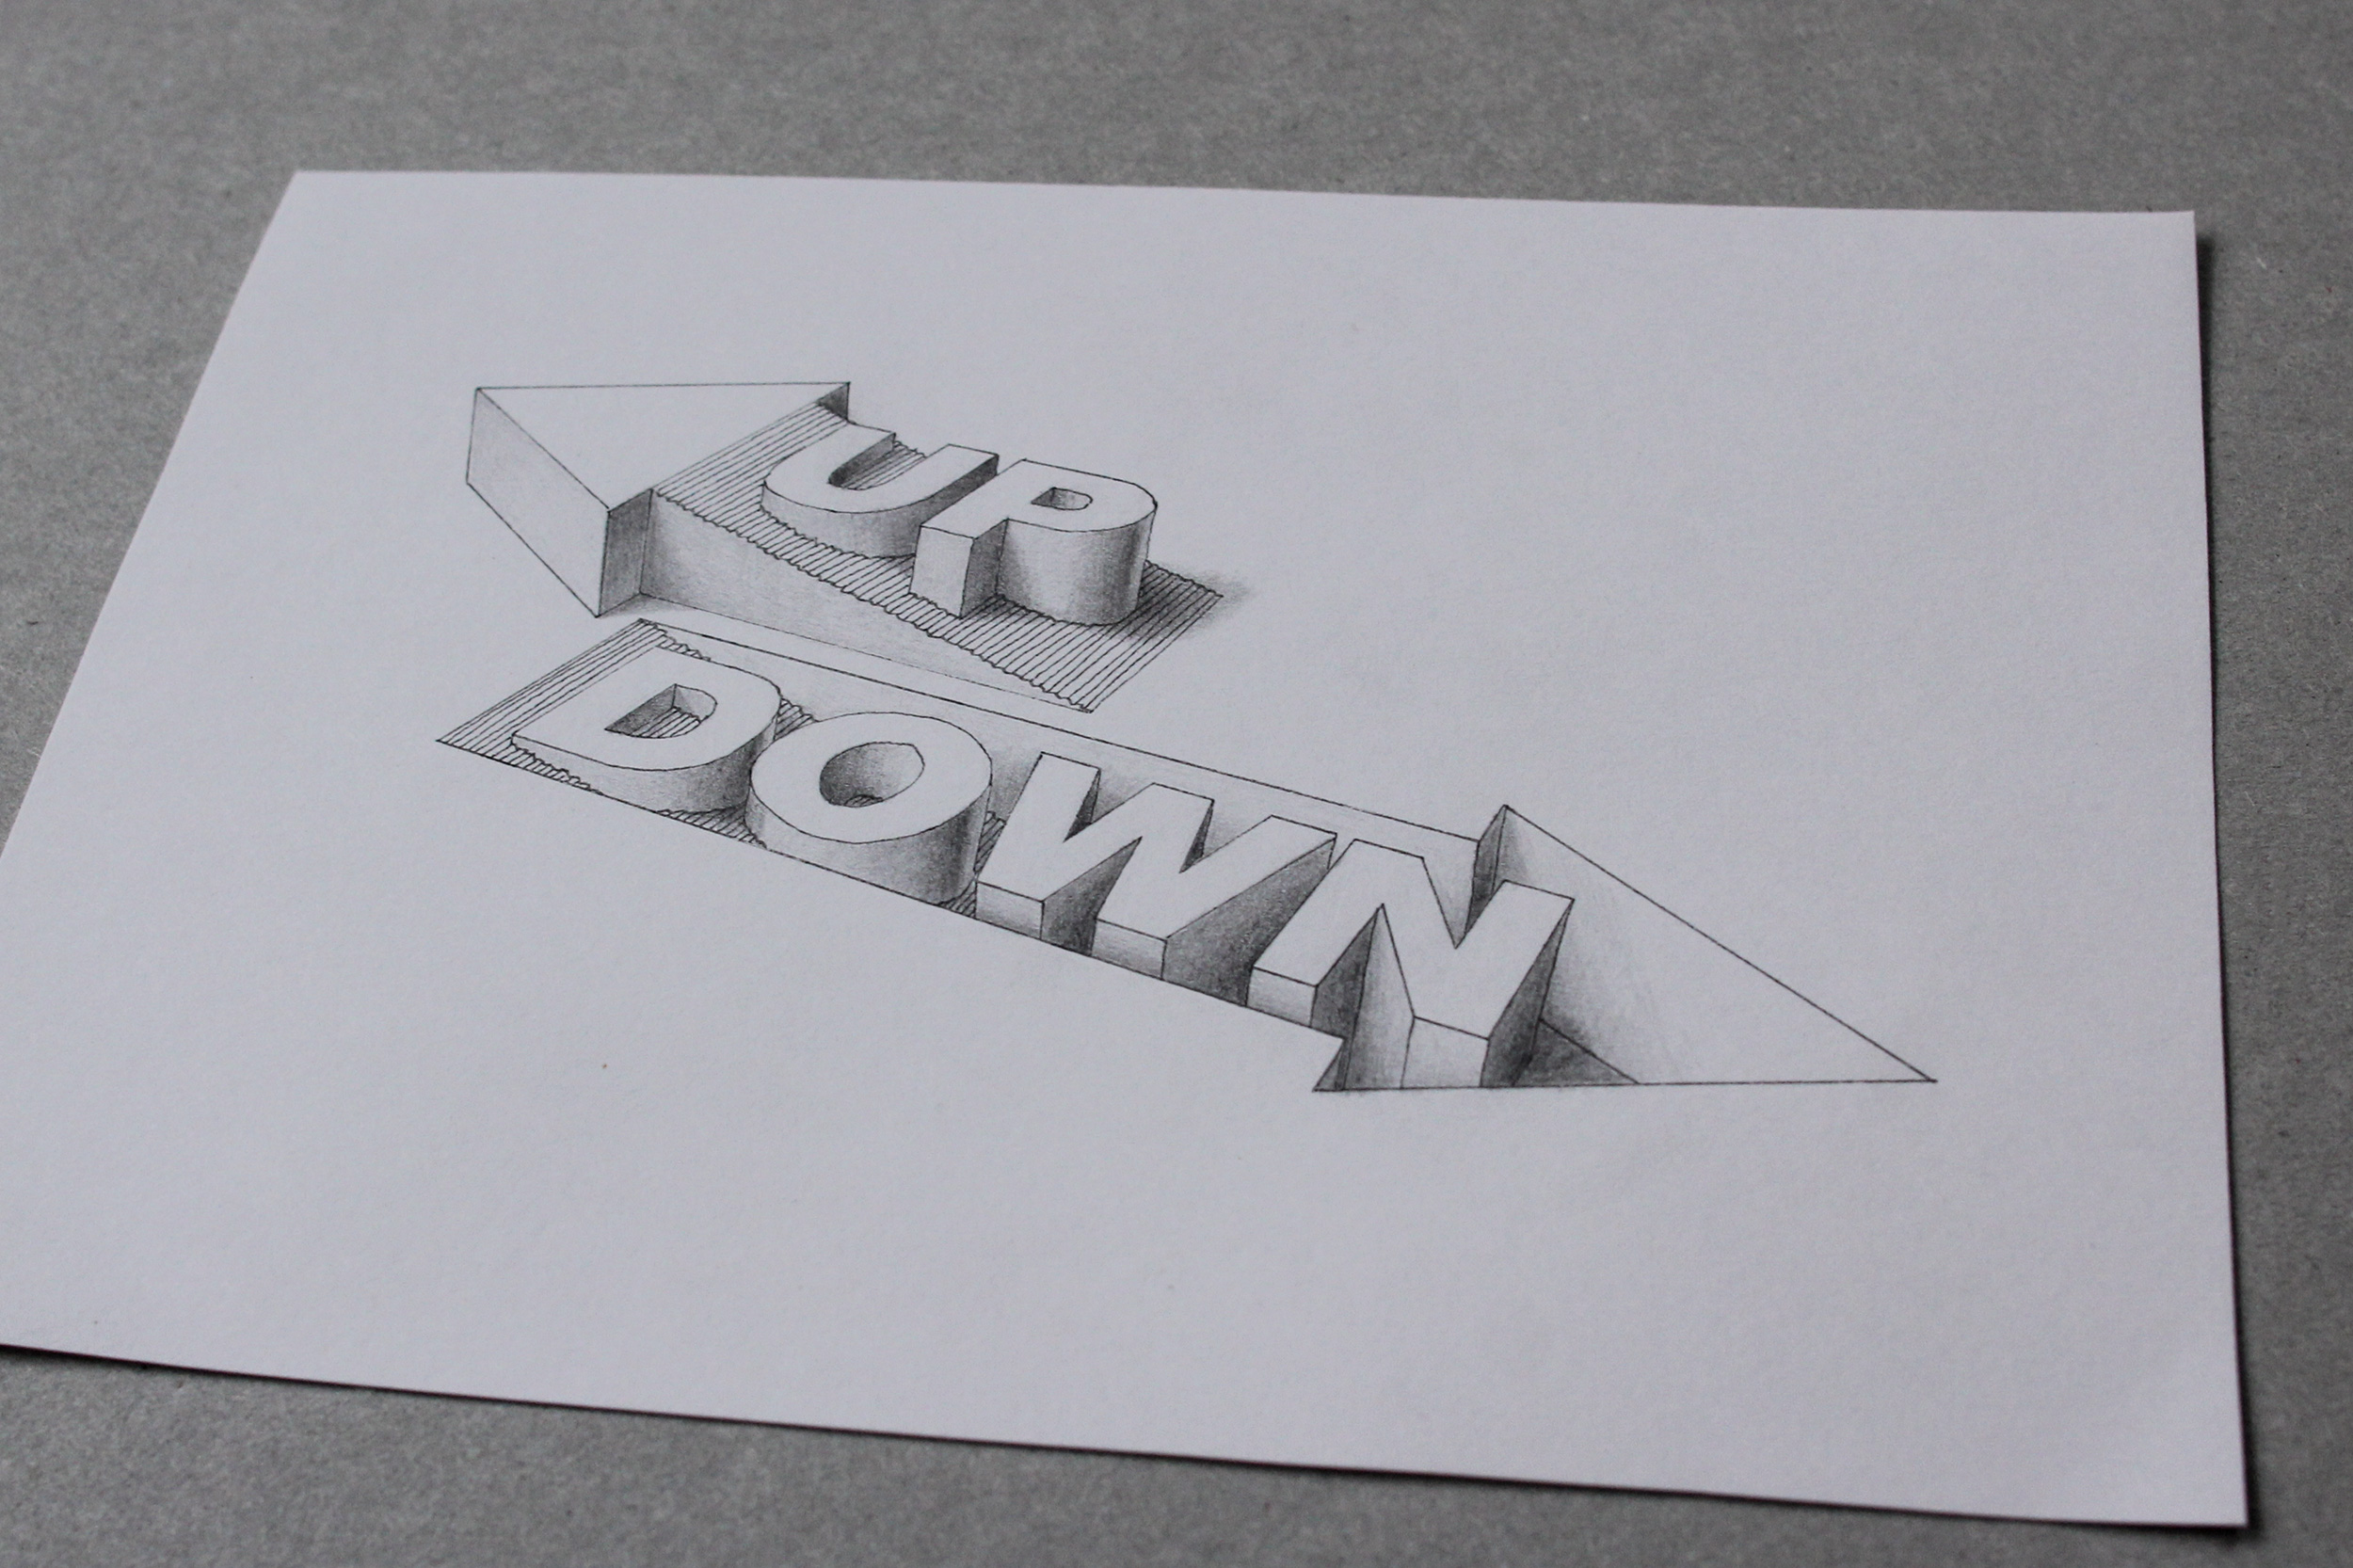 3 Easy Ways to Draw - wikiHow